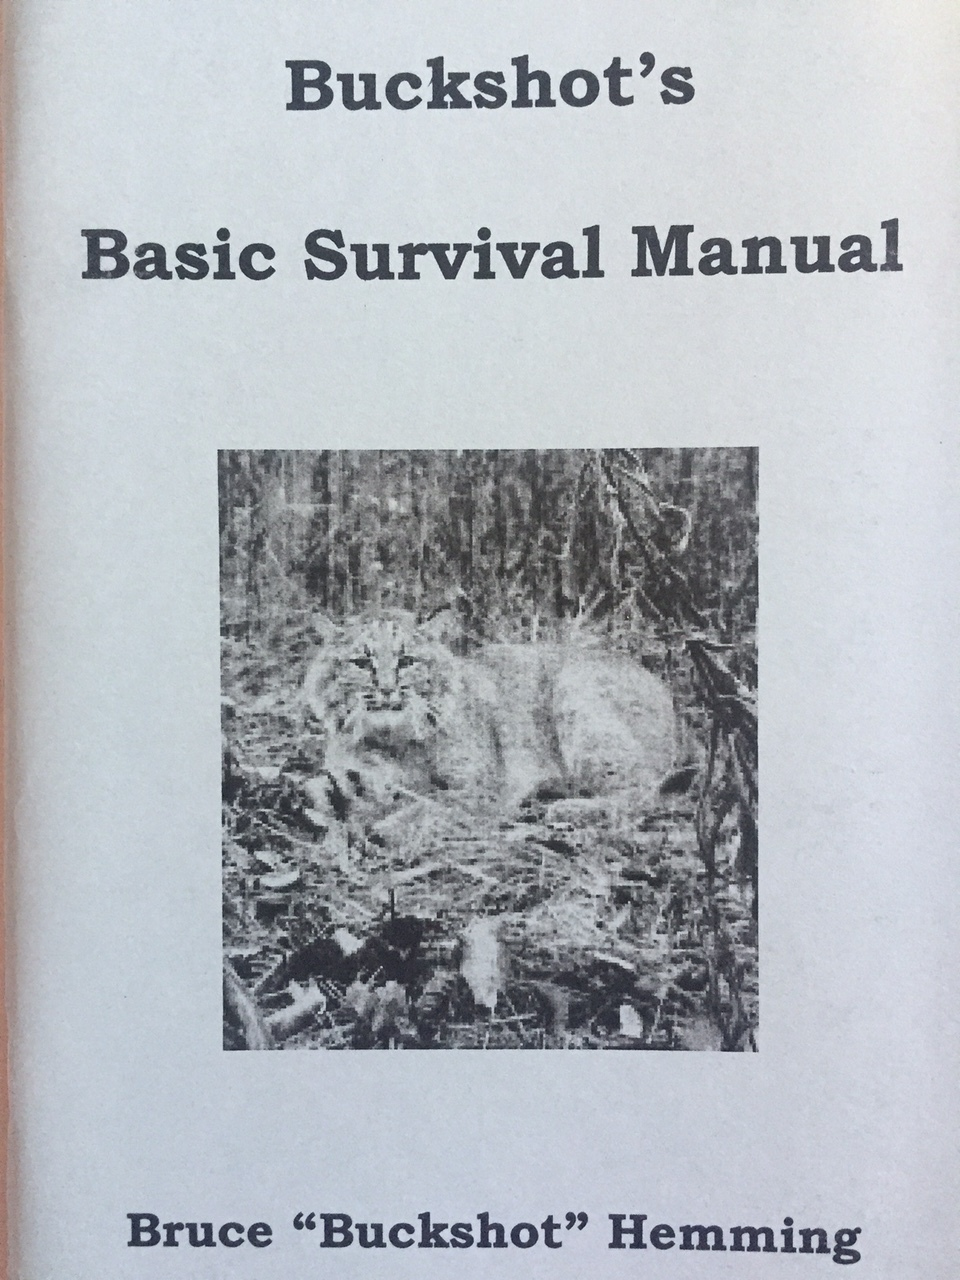 Buckshot's Basic Survival Manual